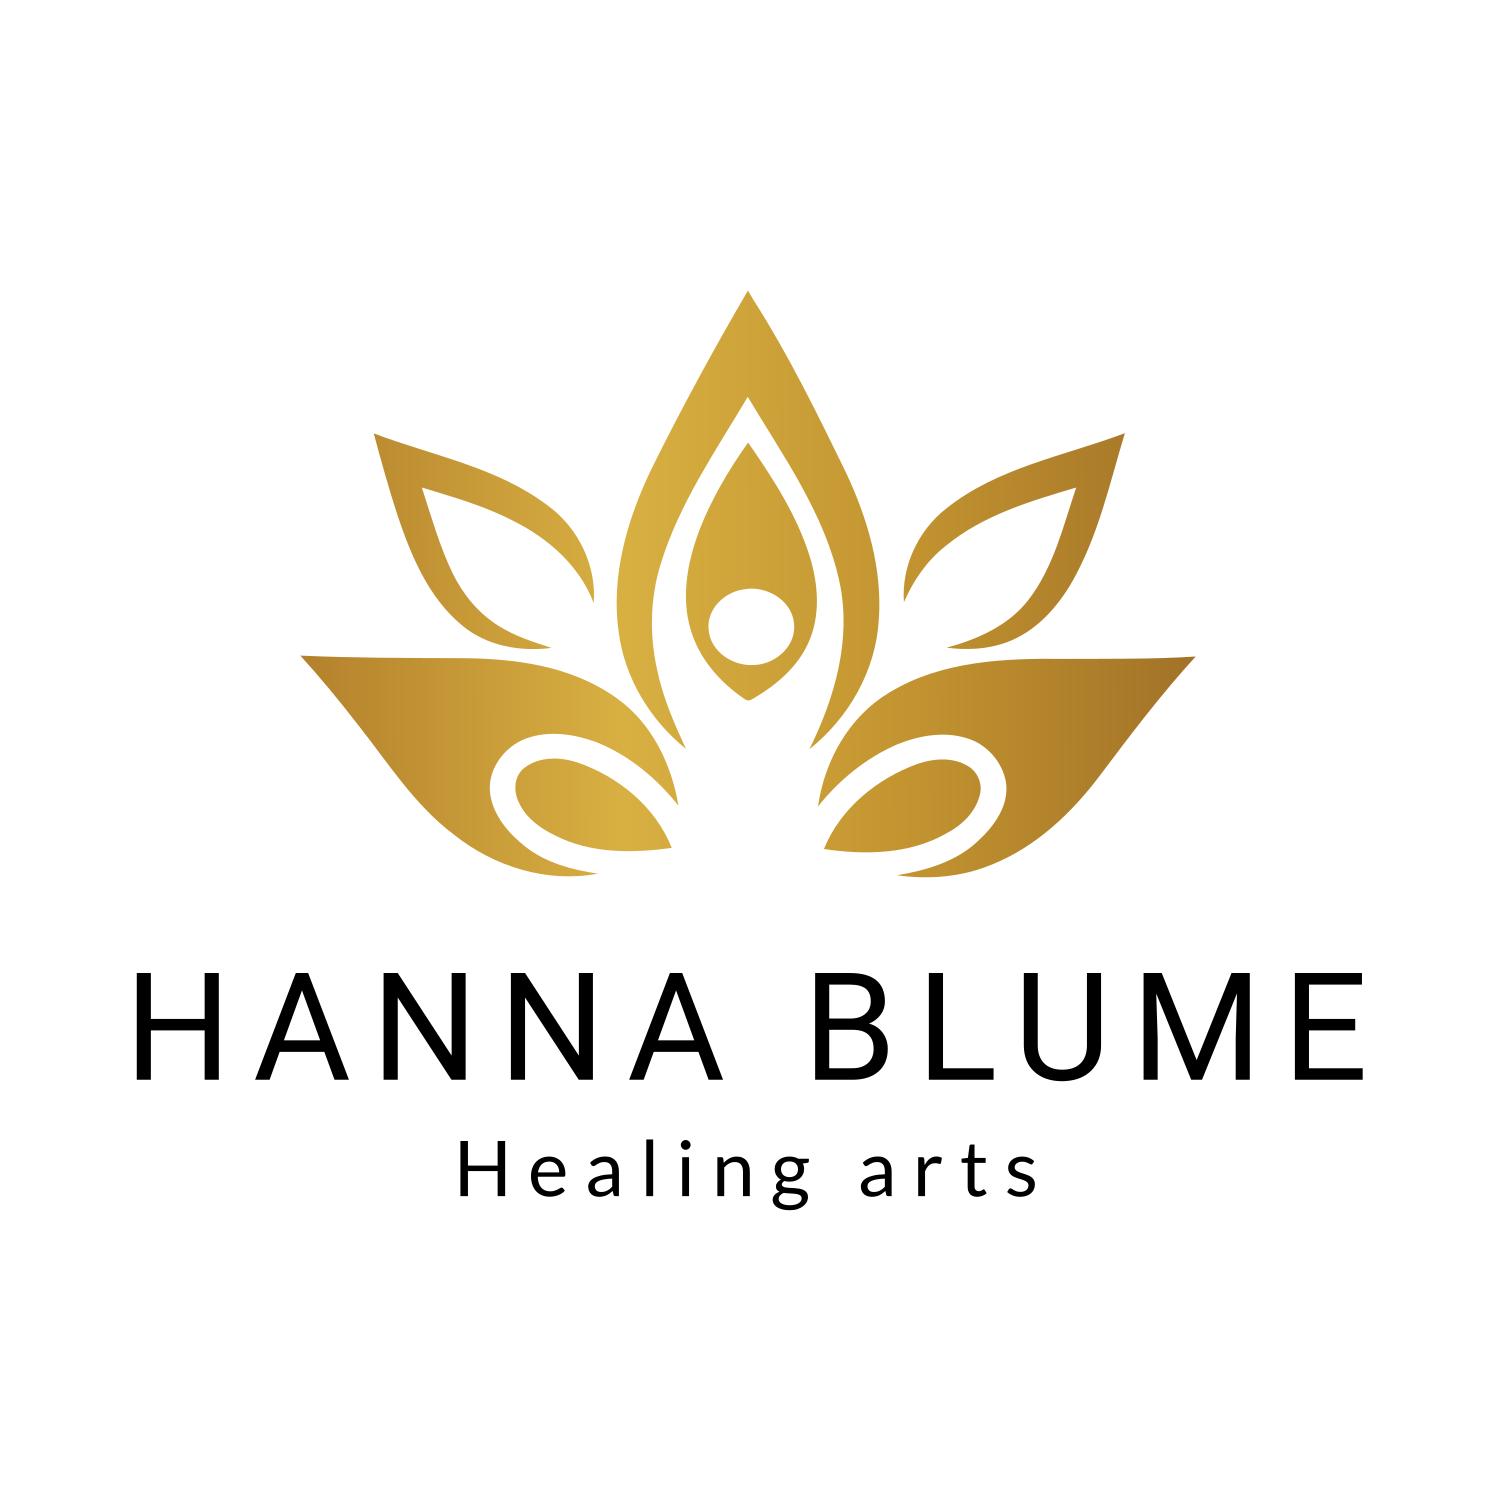 Hanna Blume